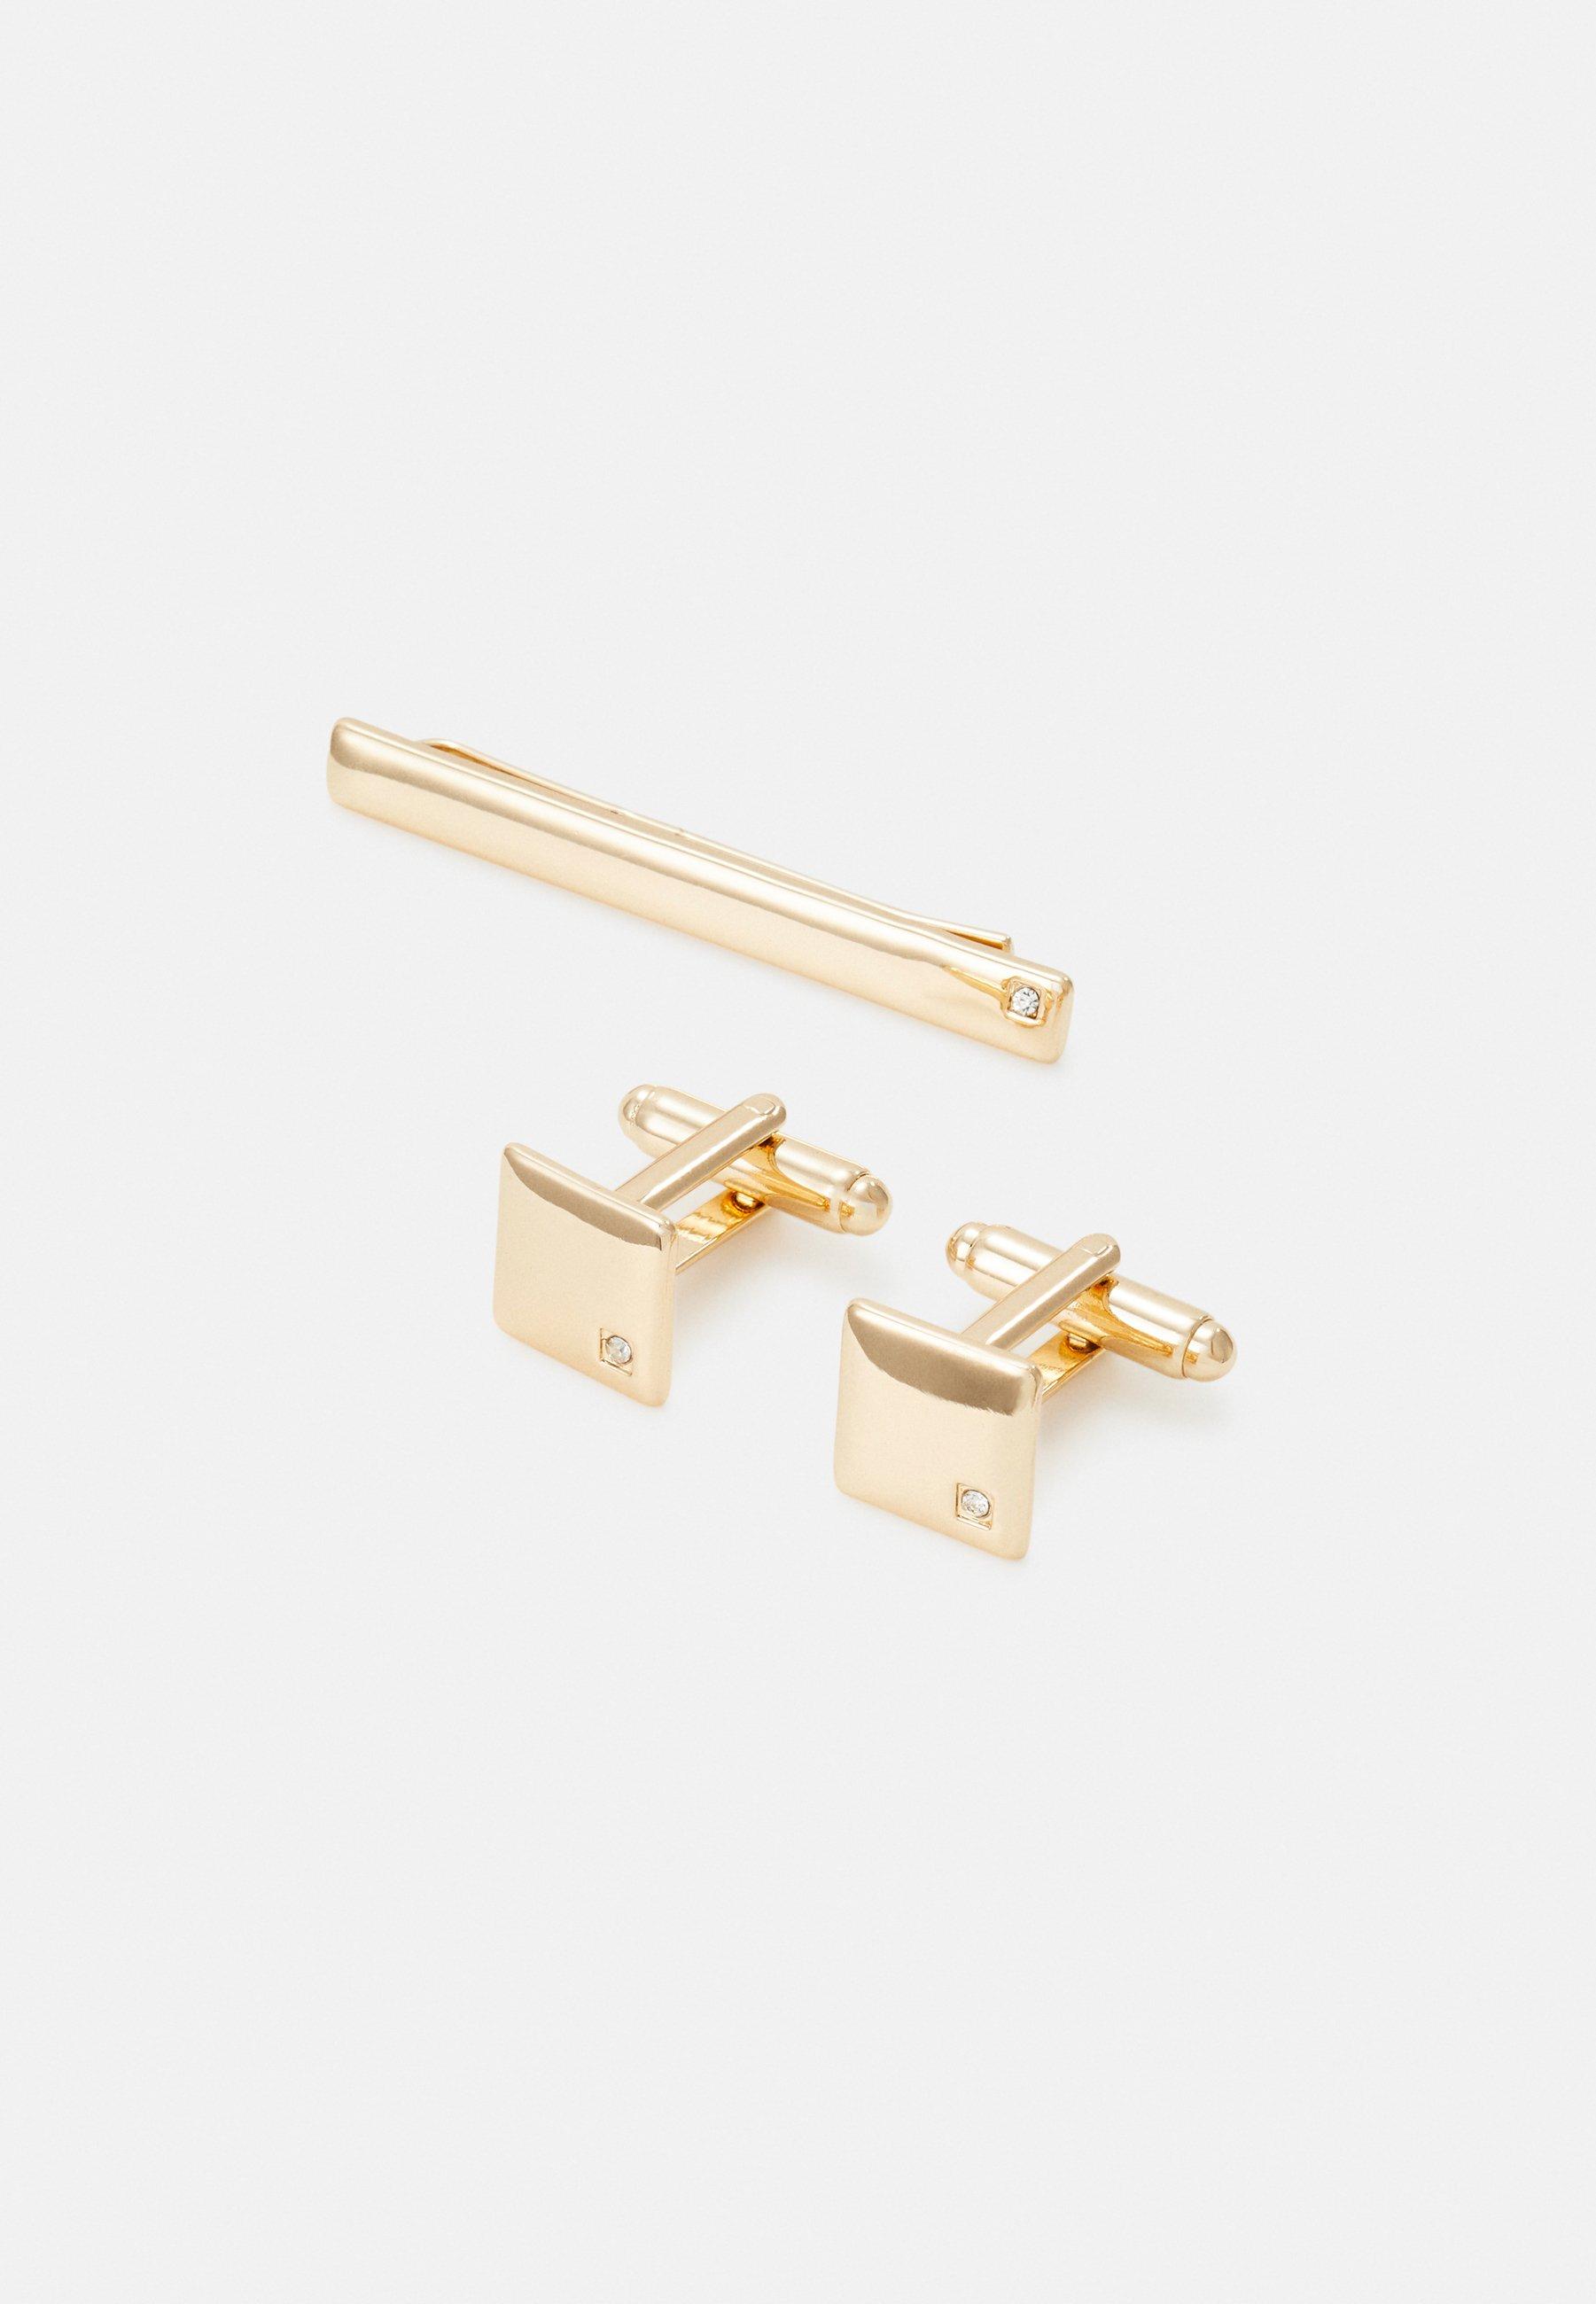 Burton Menswear London Square Set - Manschettenknopf Gold-coloured